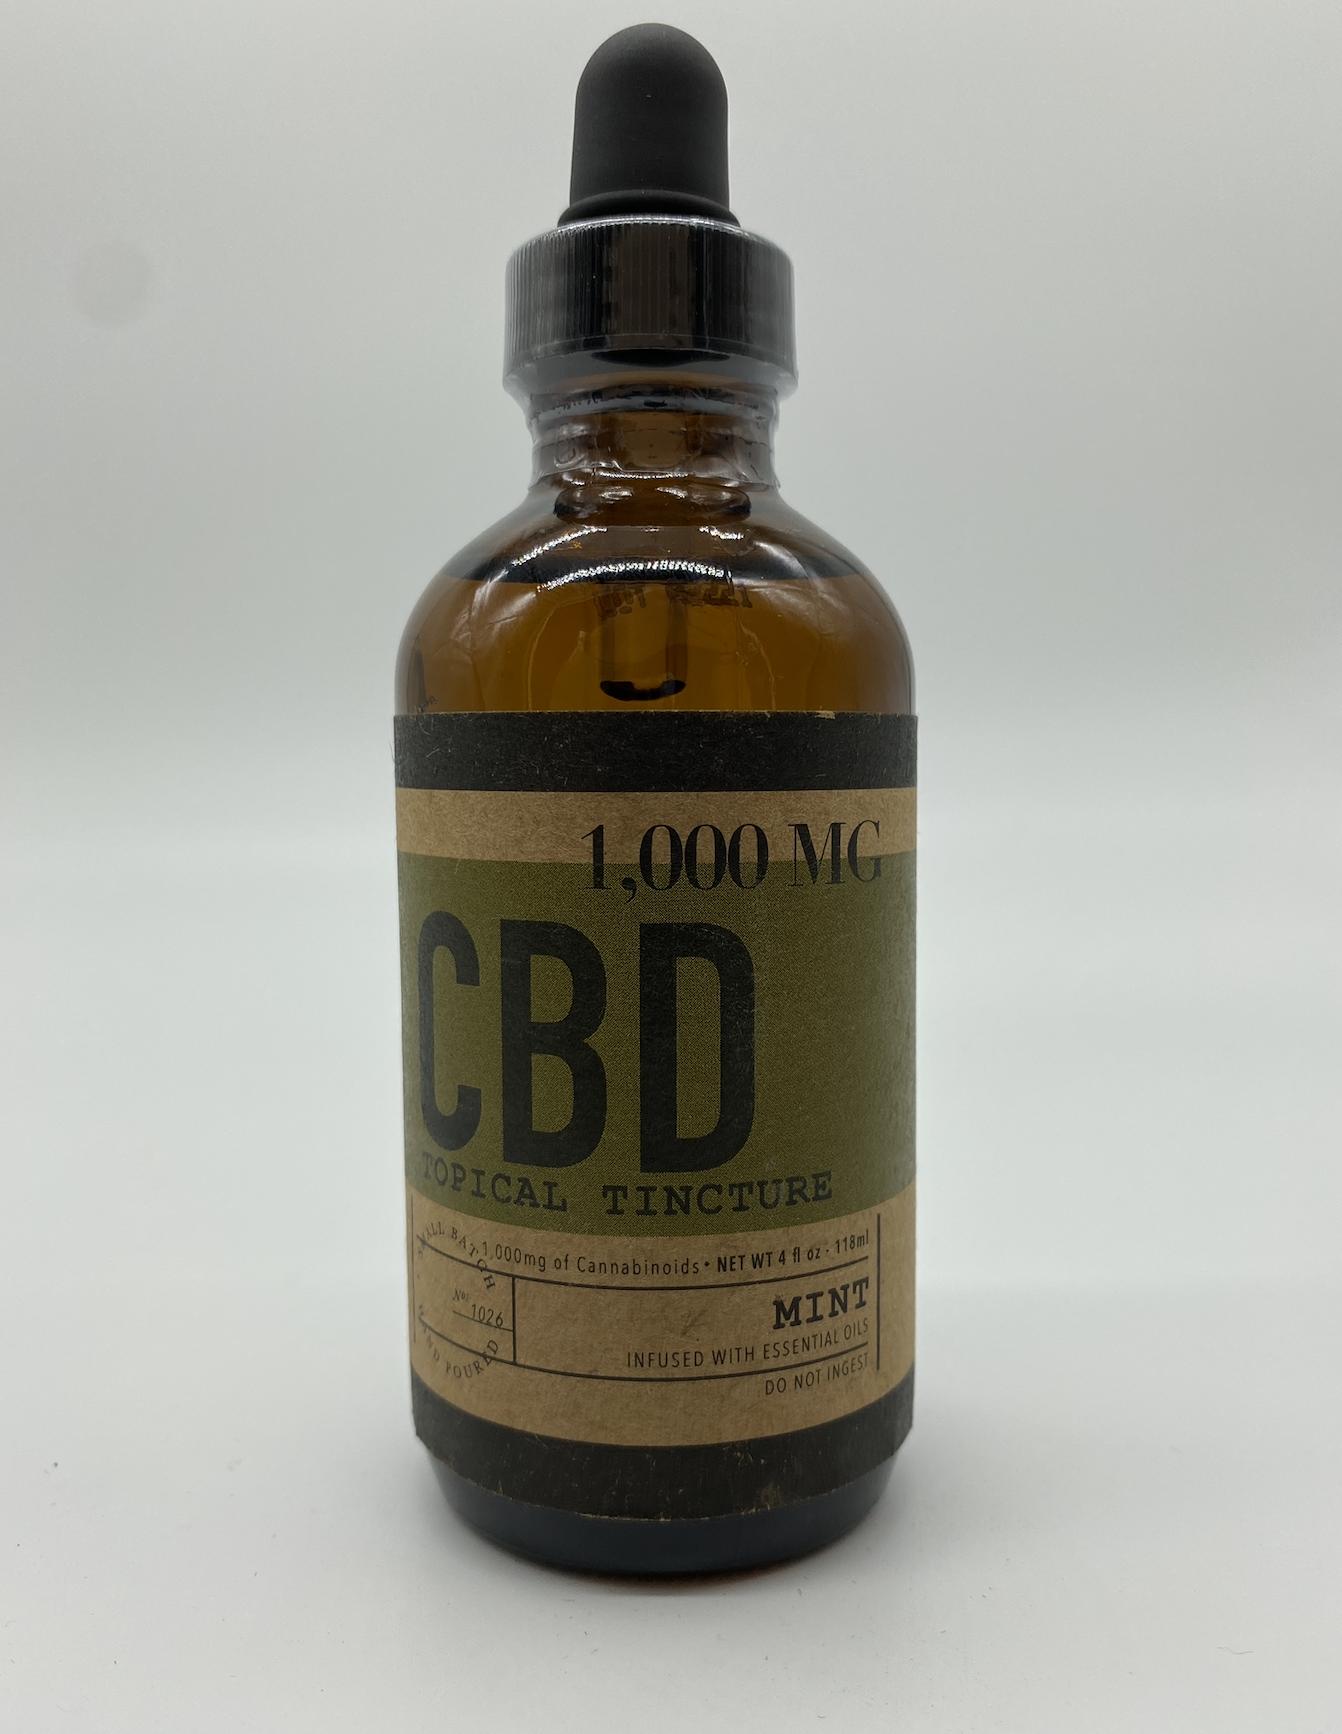 Premium Quality CBD Topical Oils Urban CBD Collective 404-443-3224